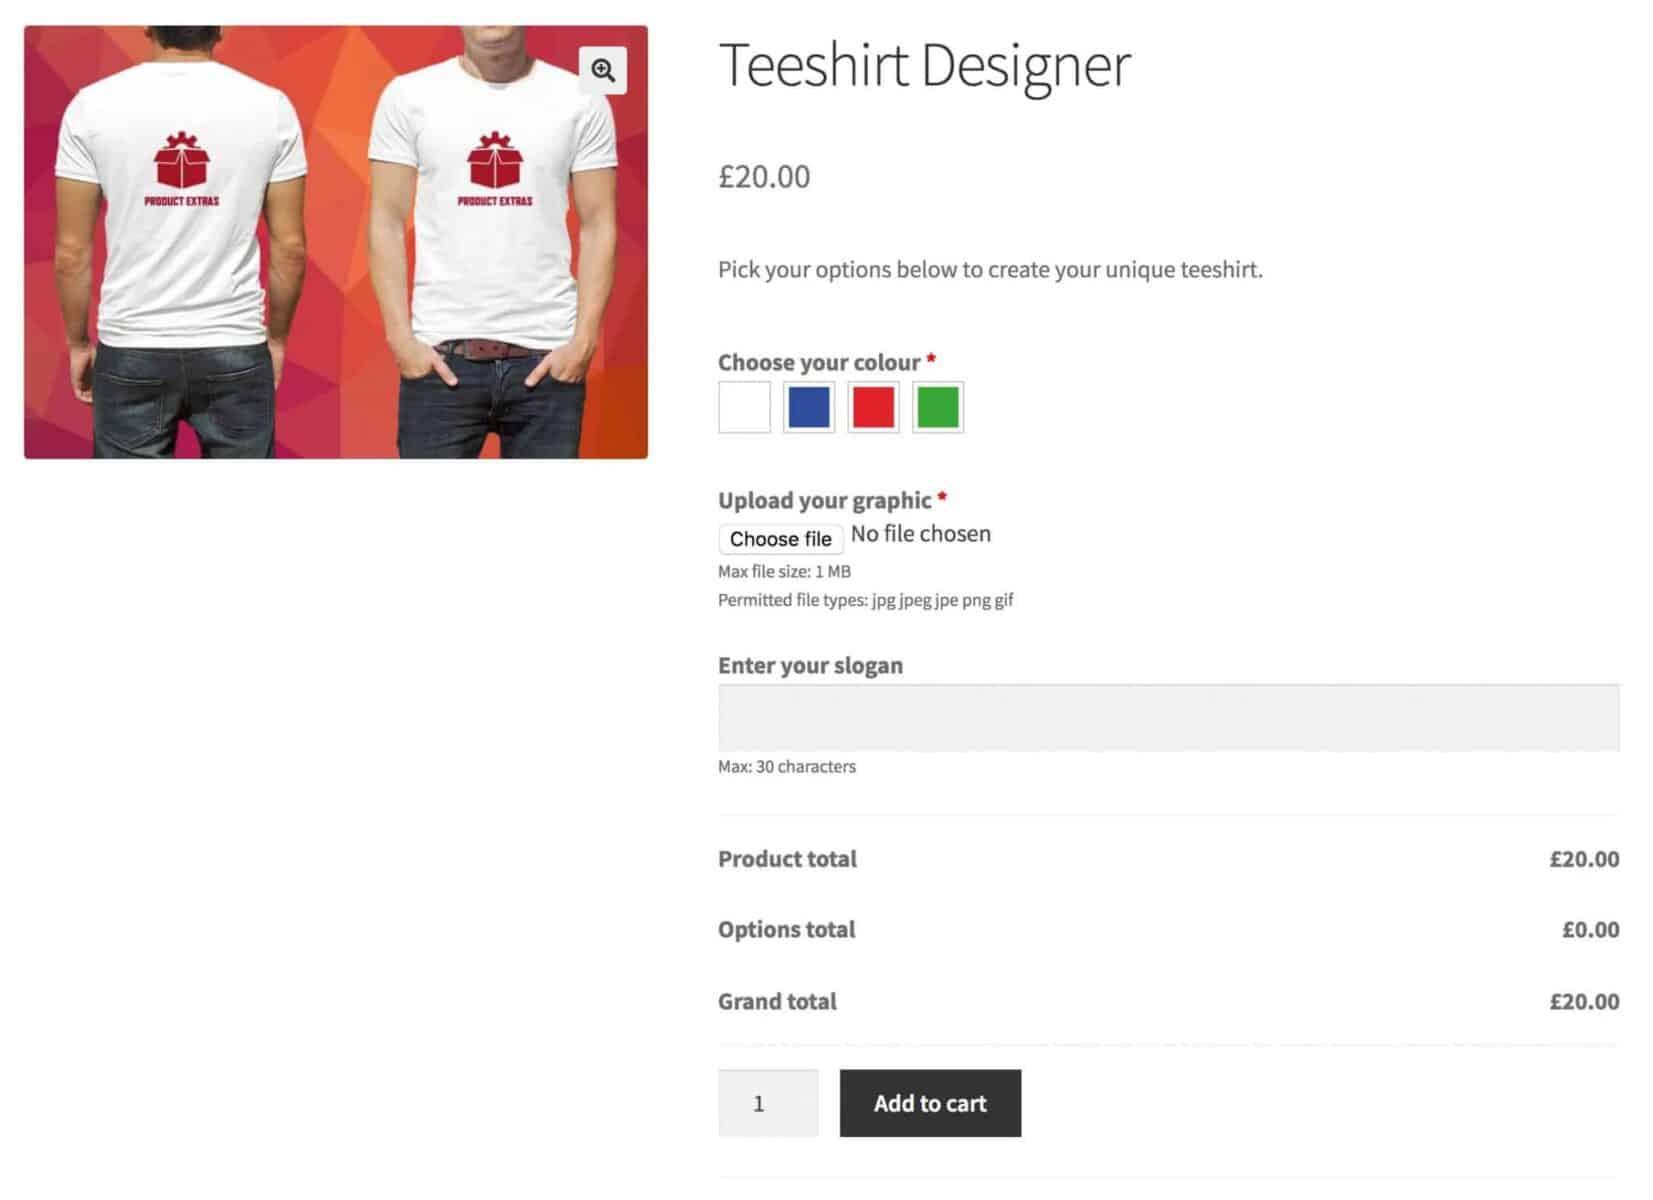 WooCommerce product customizer for tee-shirt designer